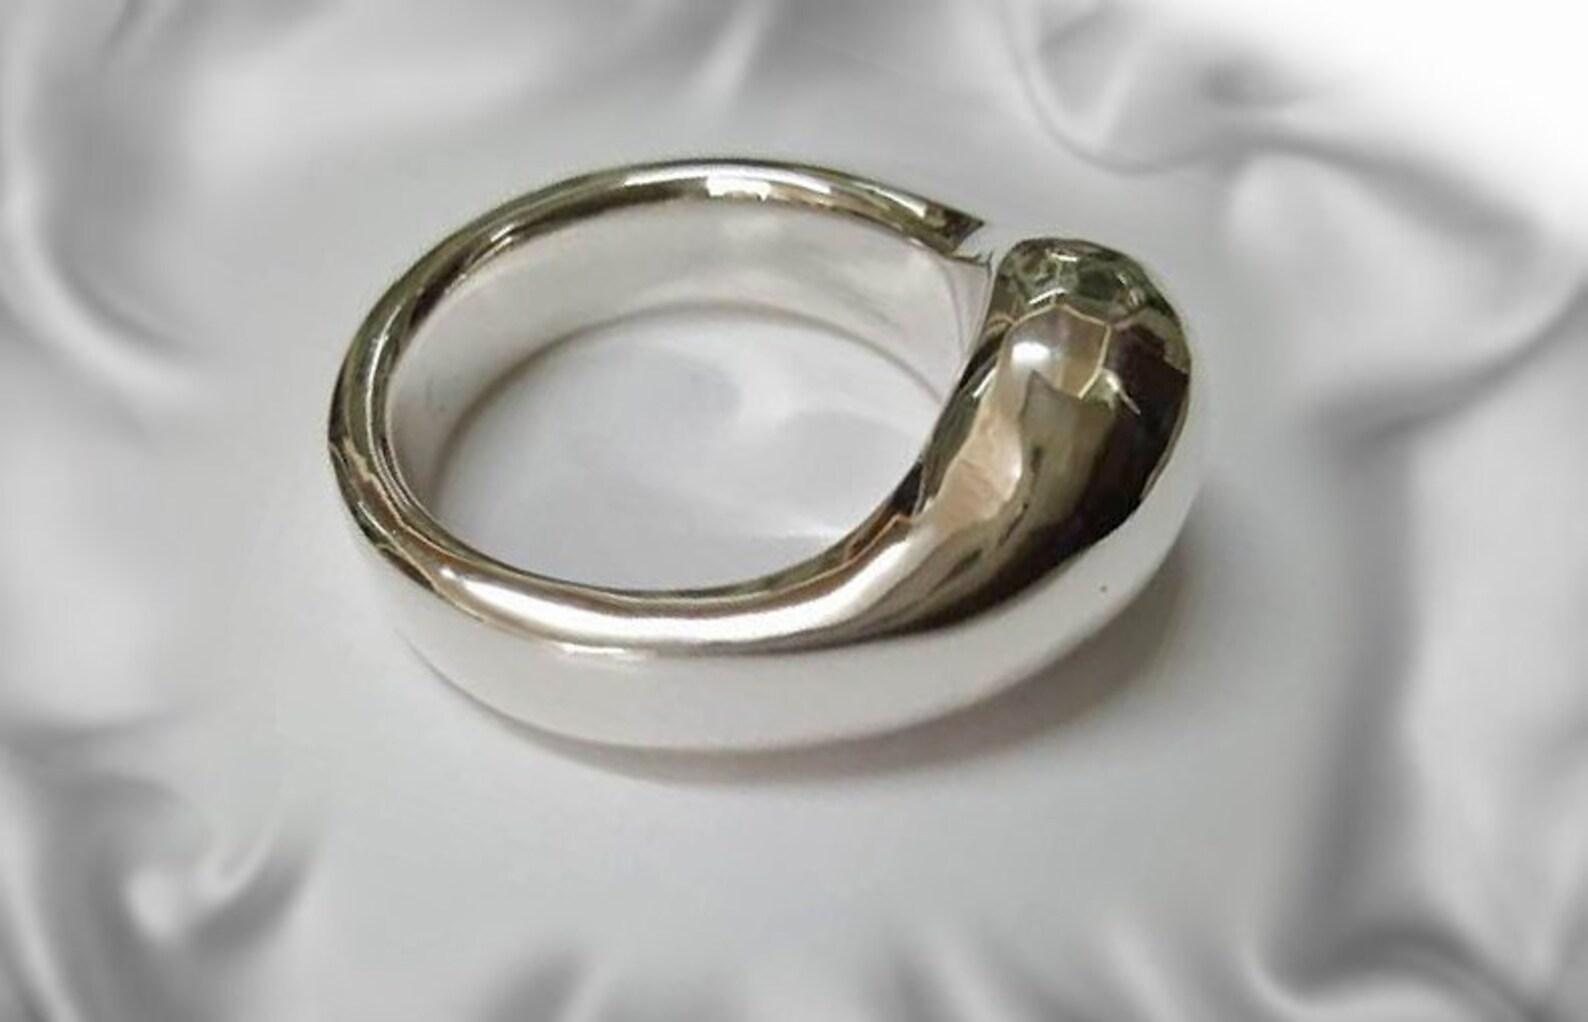 Erotic Erecting Penis Necklace